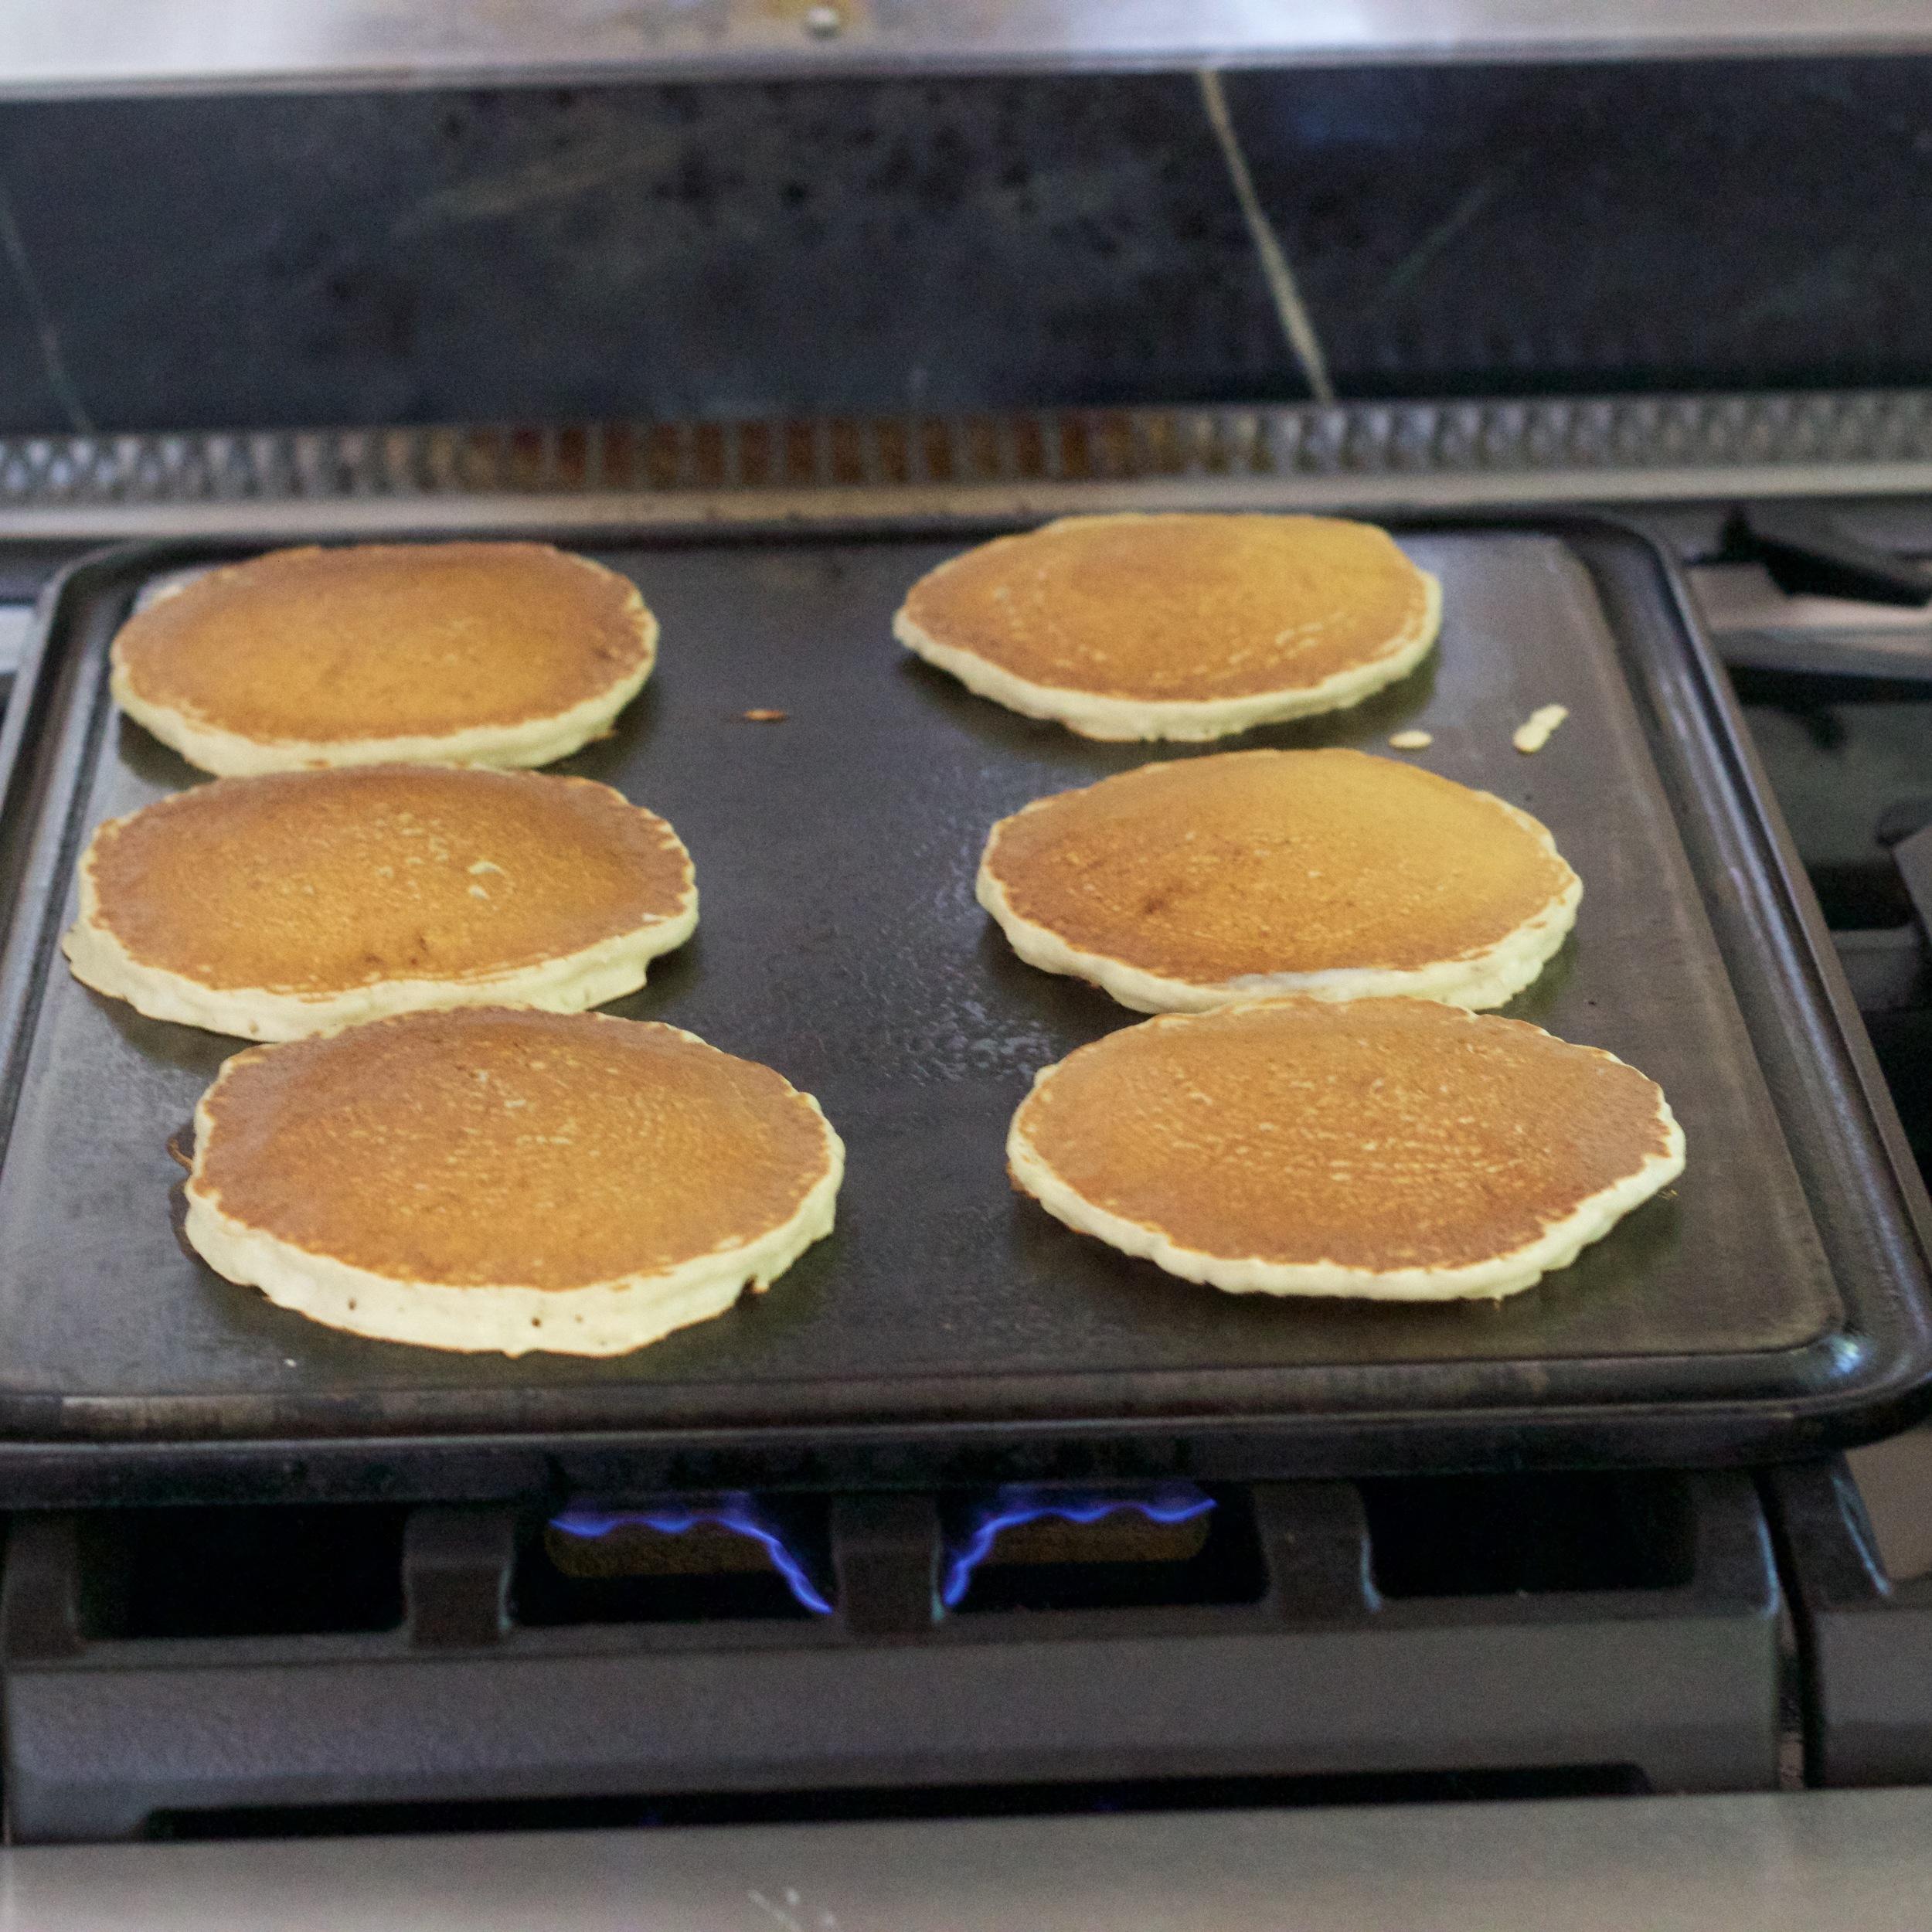 Pancakes on Baking Steel Griddle